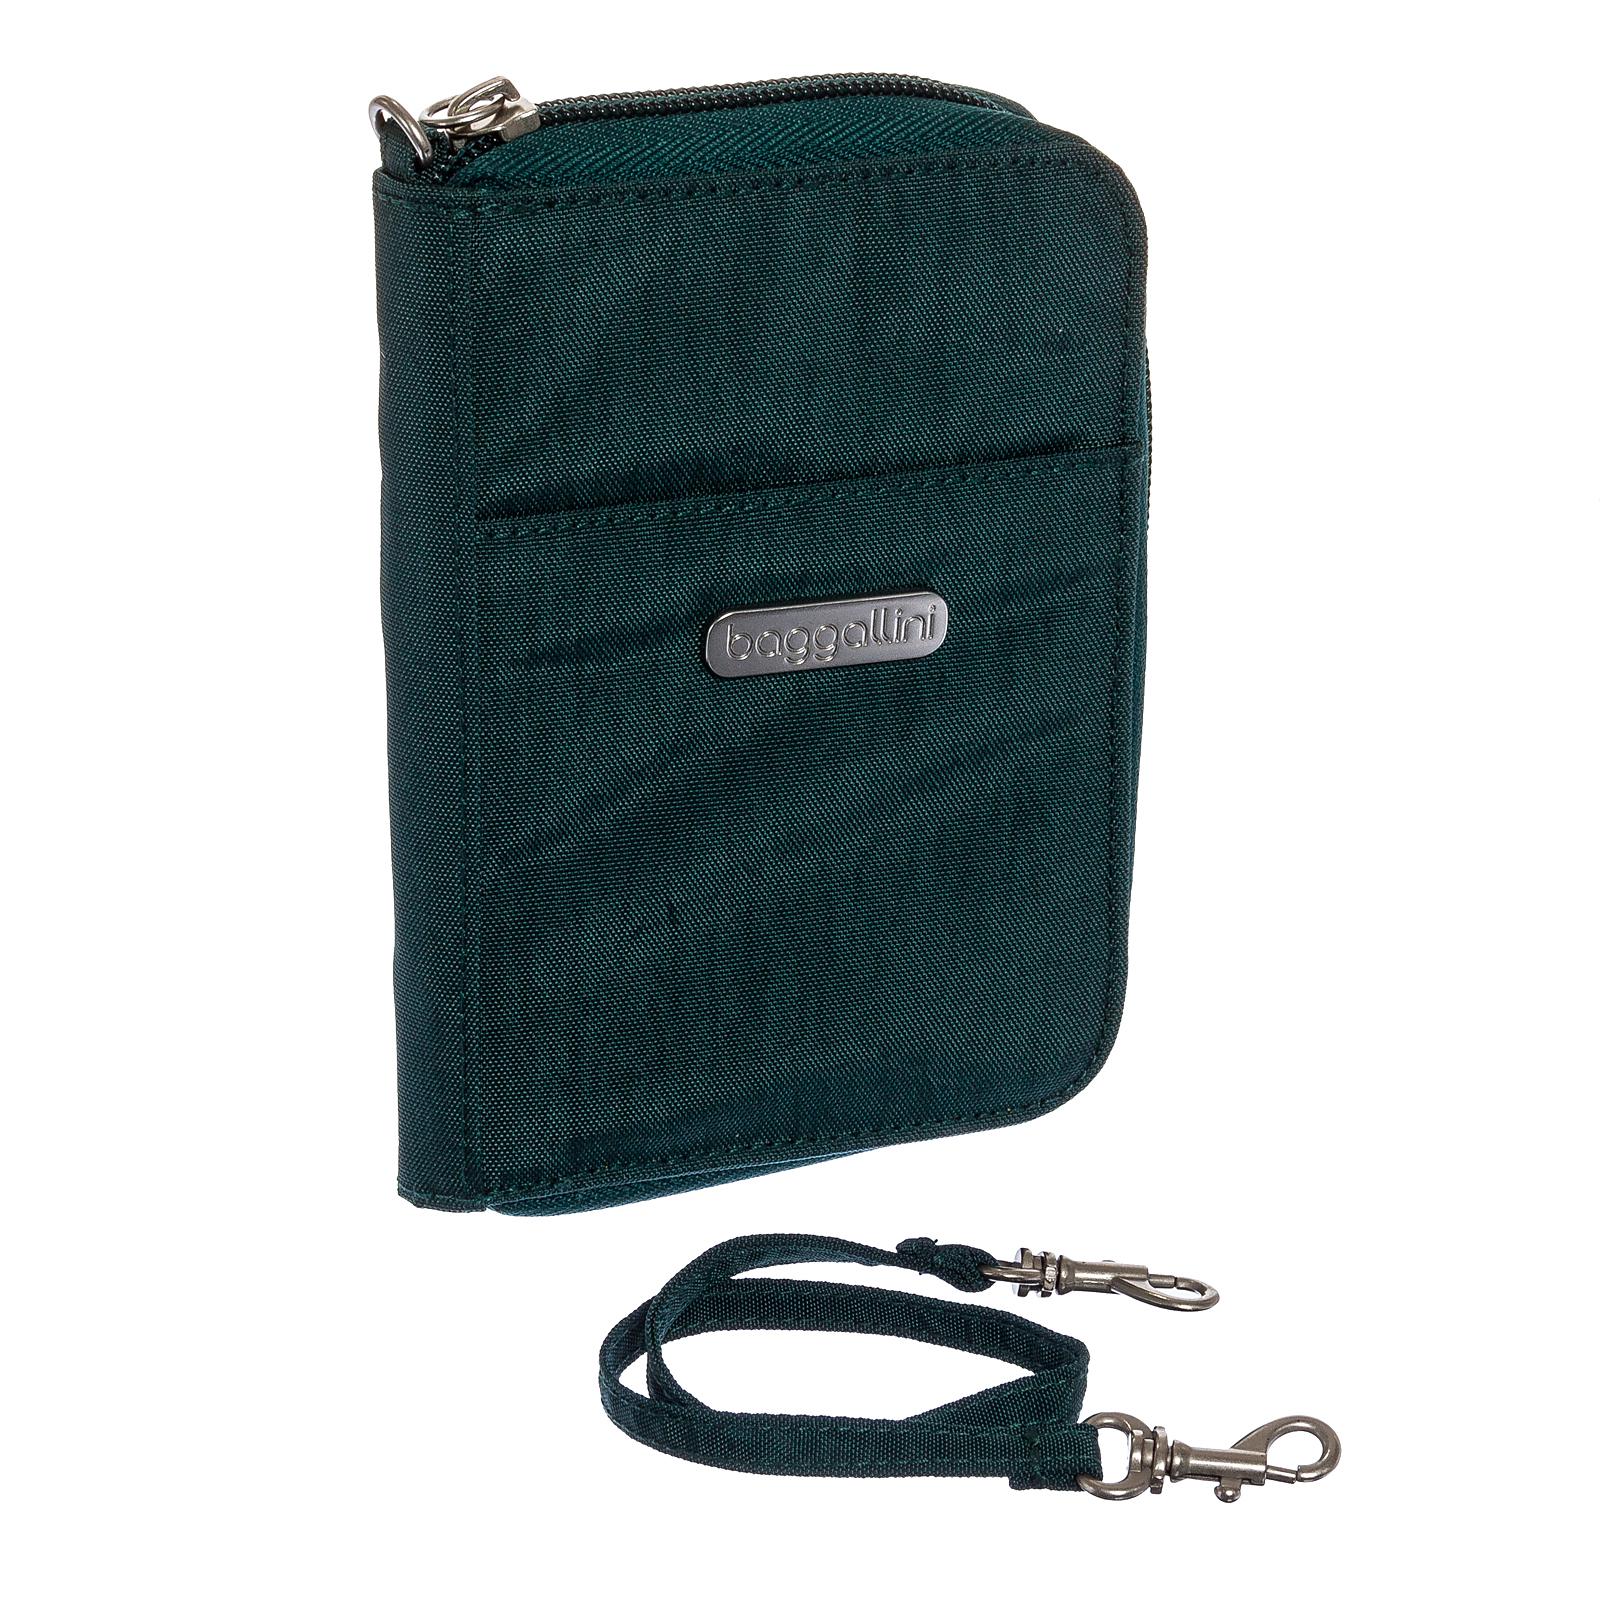 Baggallini Baggallini Womens Nylon Essential Zip Around Wristlet Wallet (Forest)